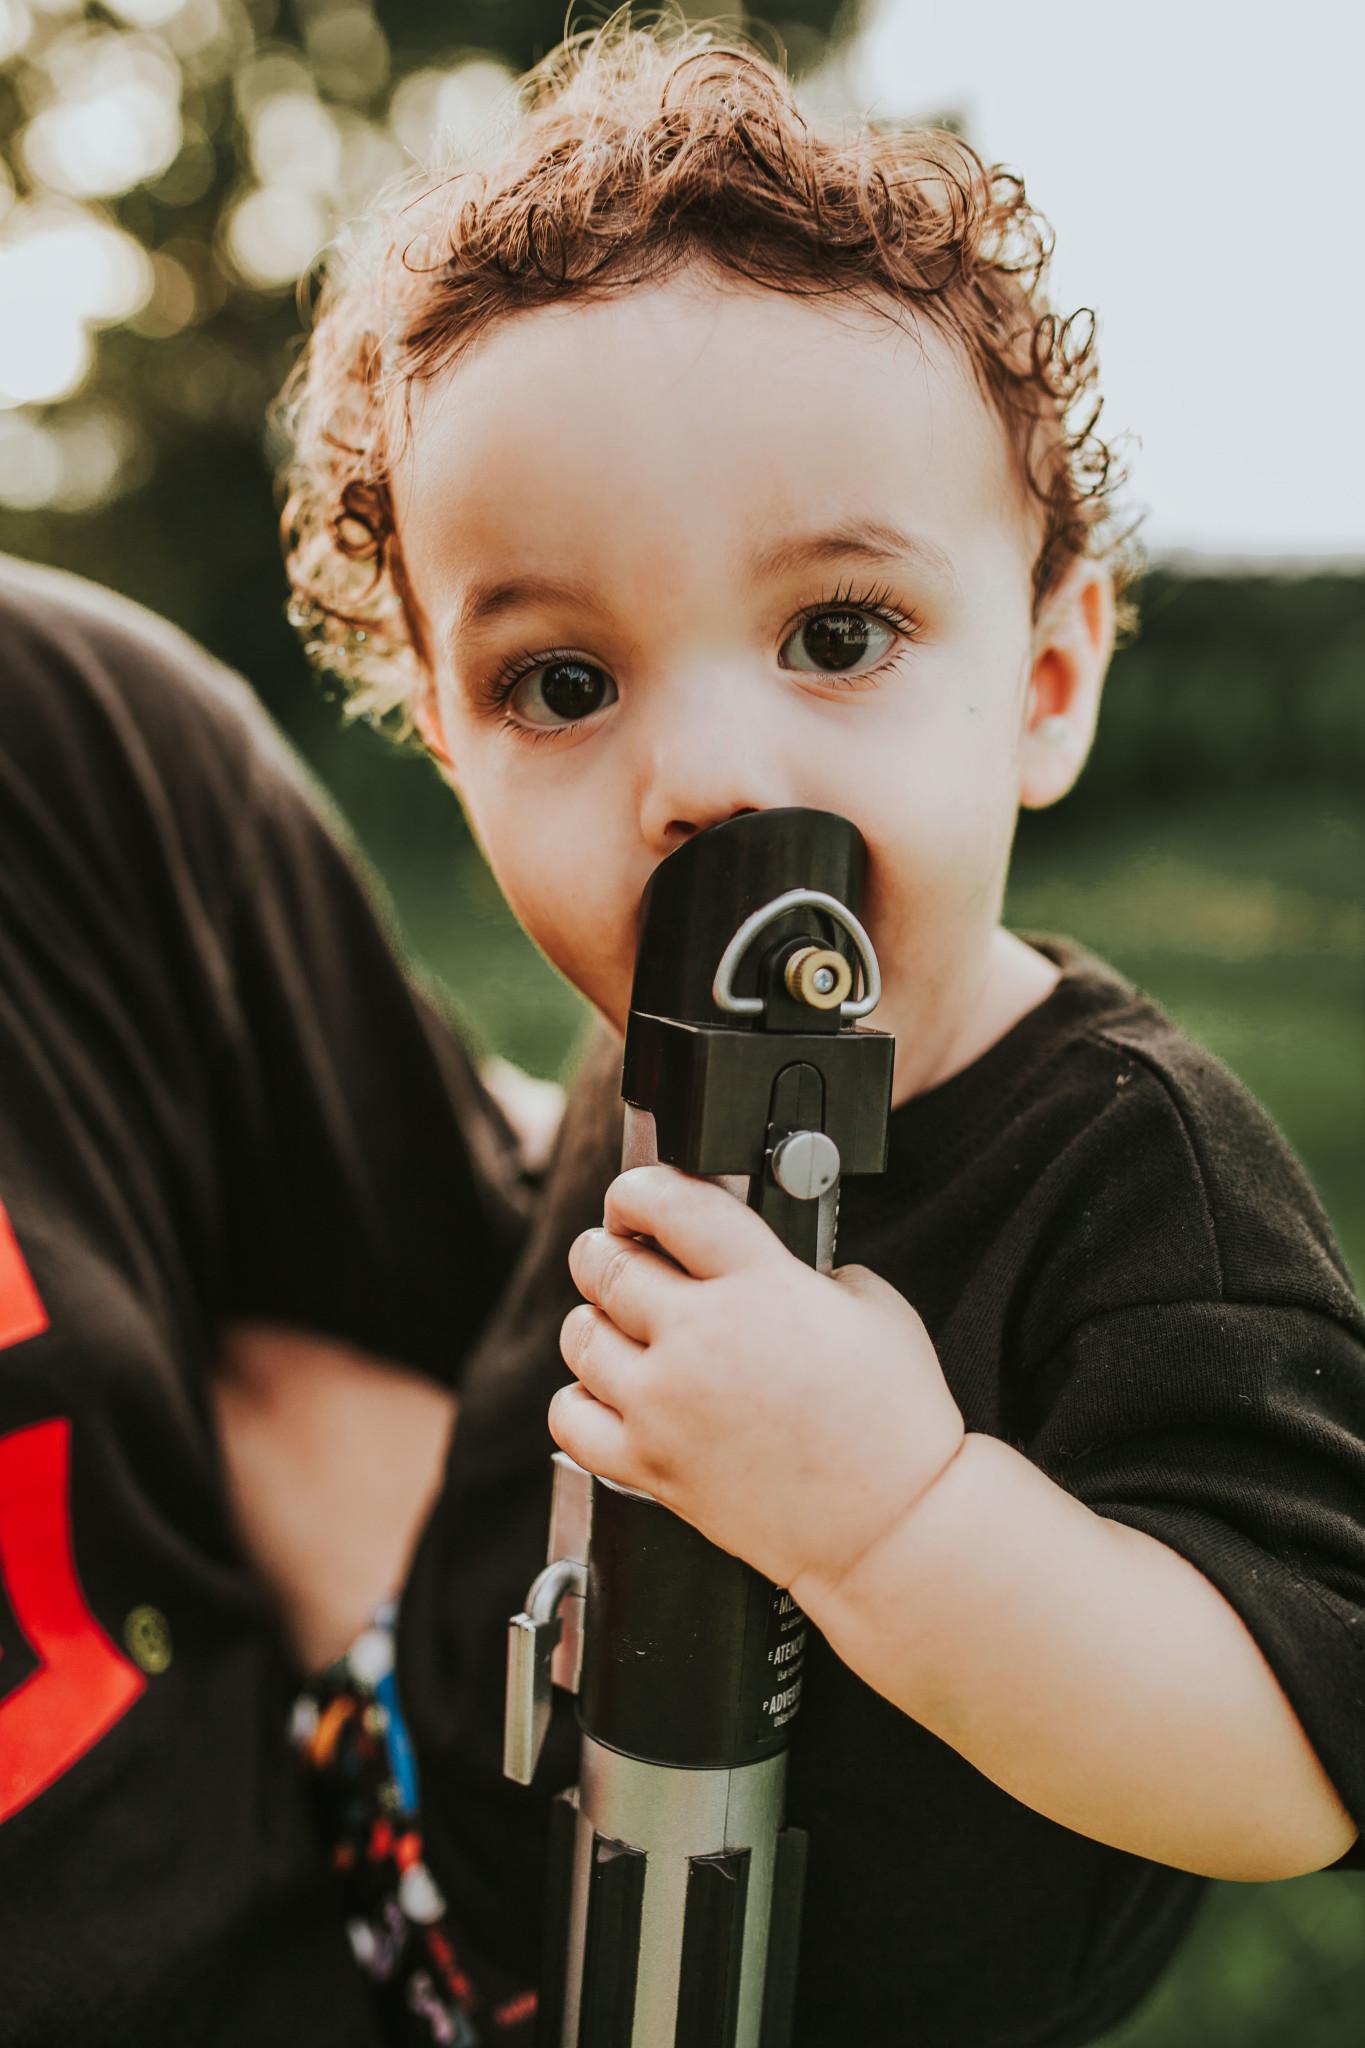 Orlando family session photographer